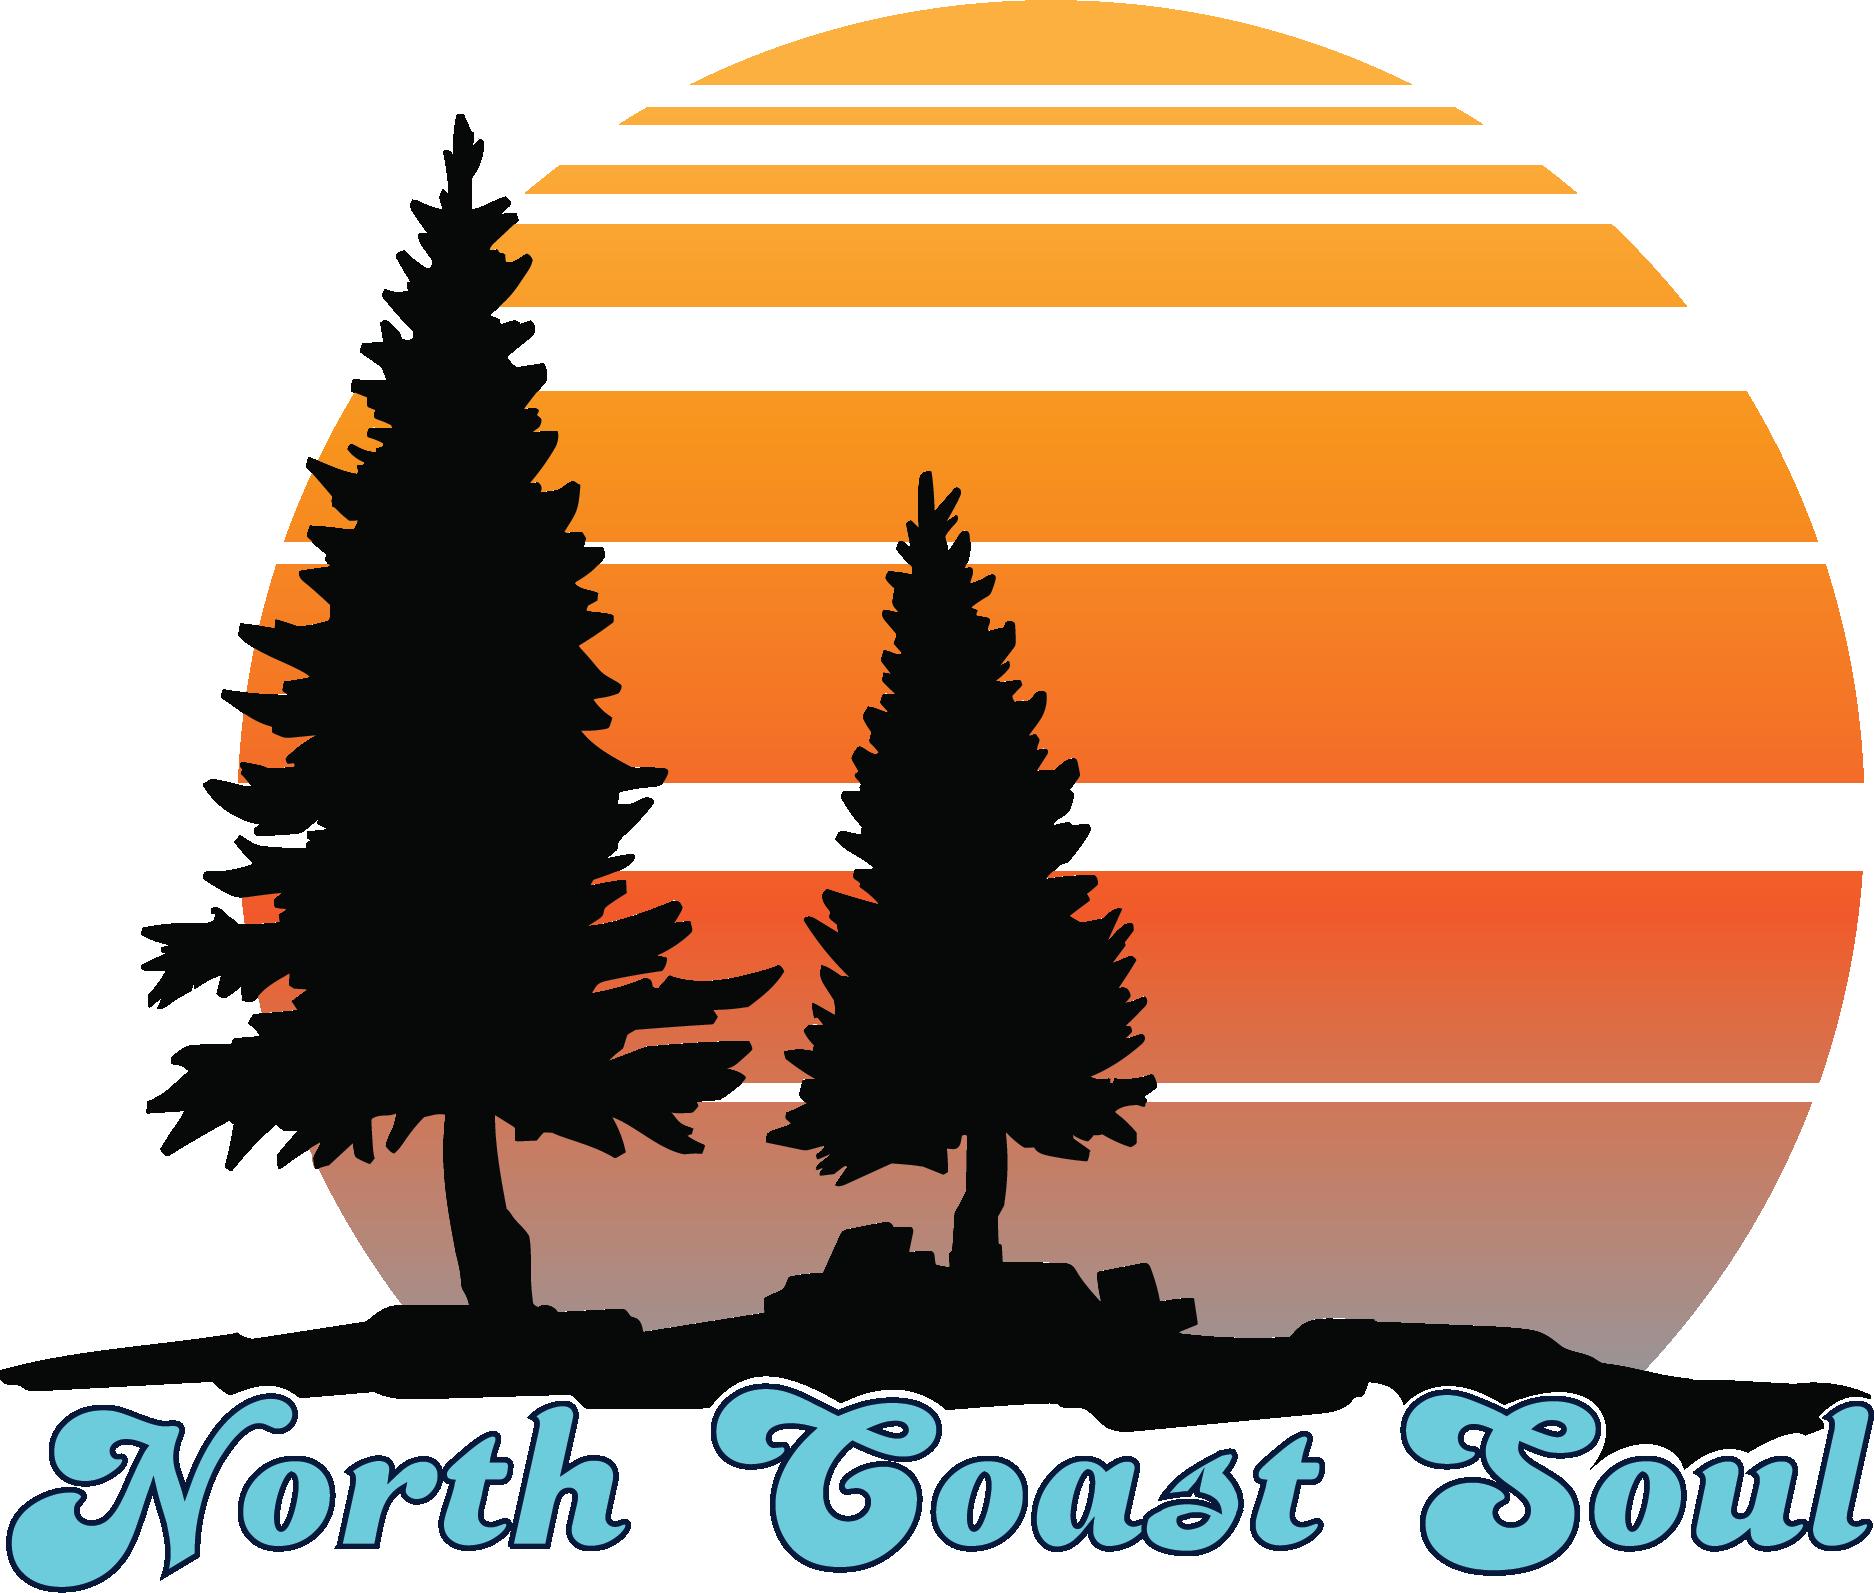 north_coast_soul_color_navy_outline.png